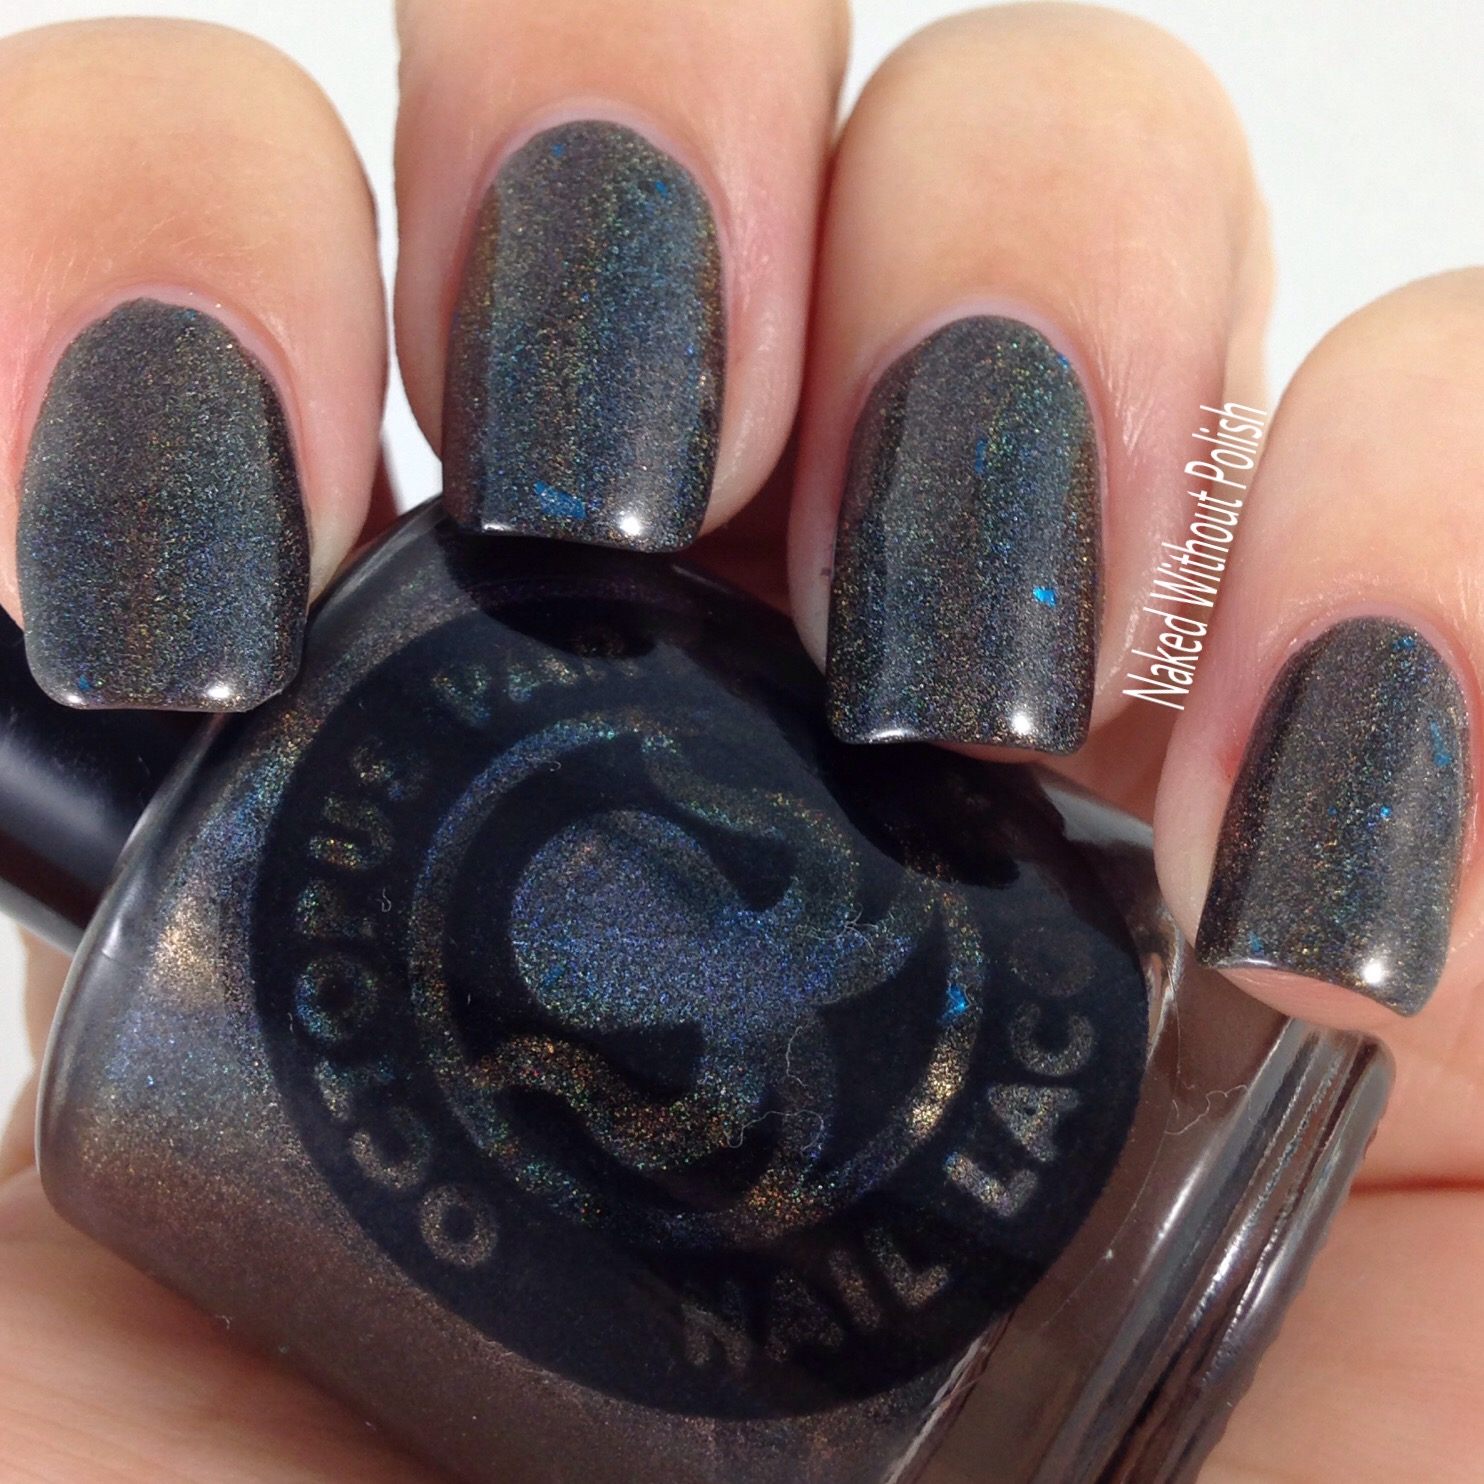 Octopus-Party-Nail-Lacquer-Logan-6